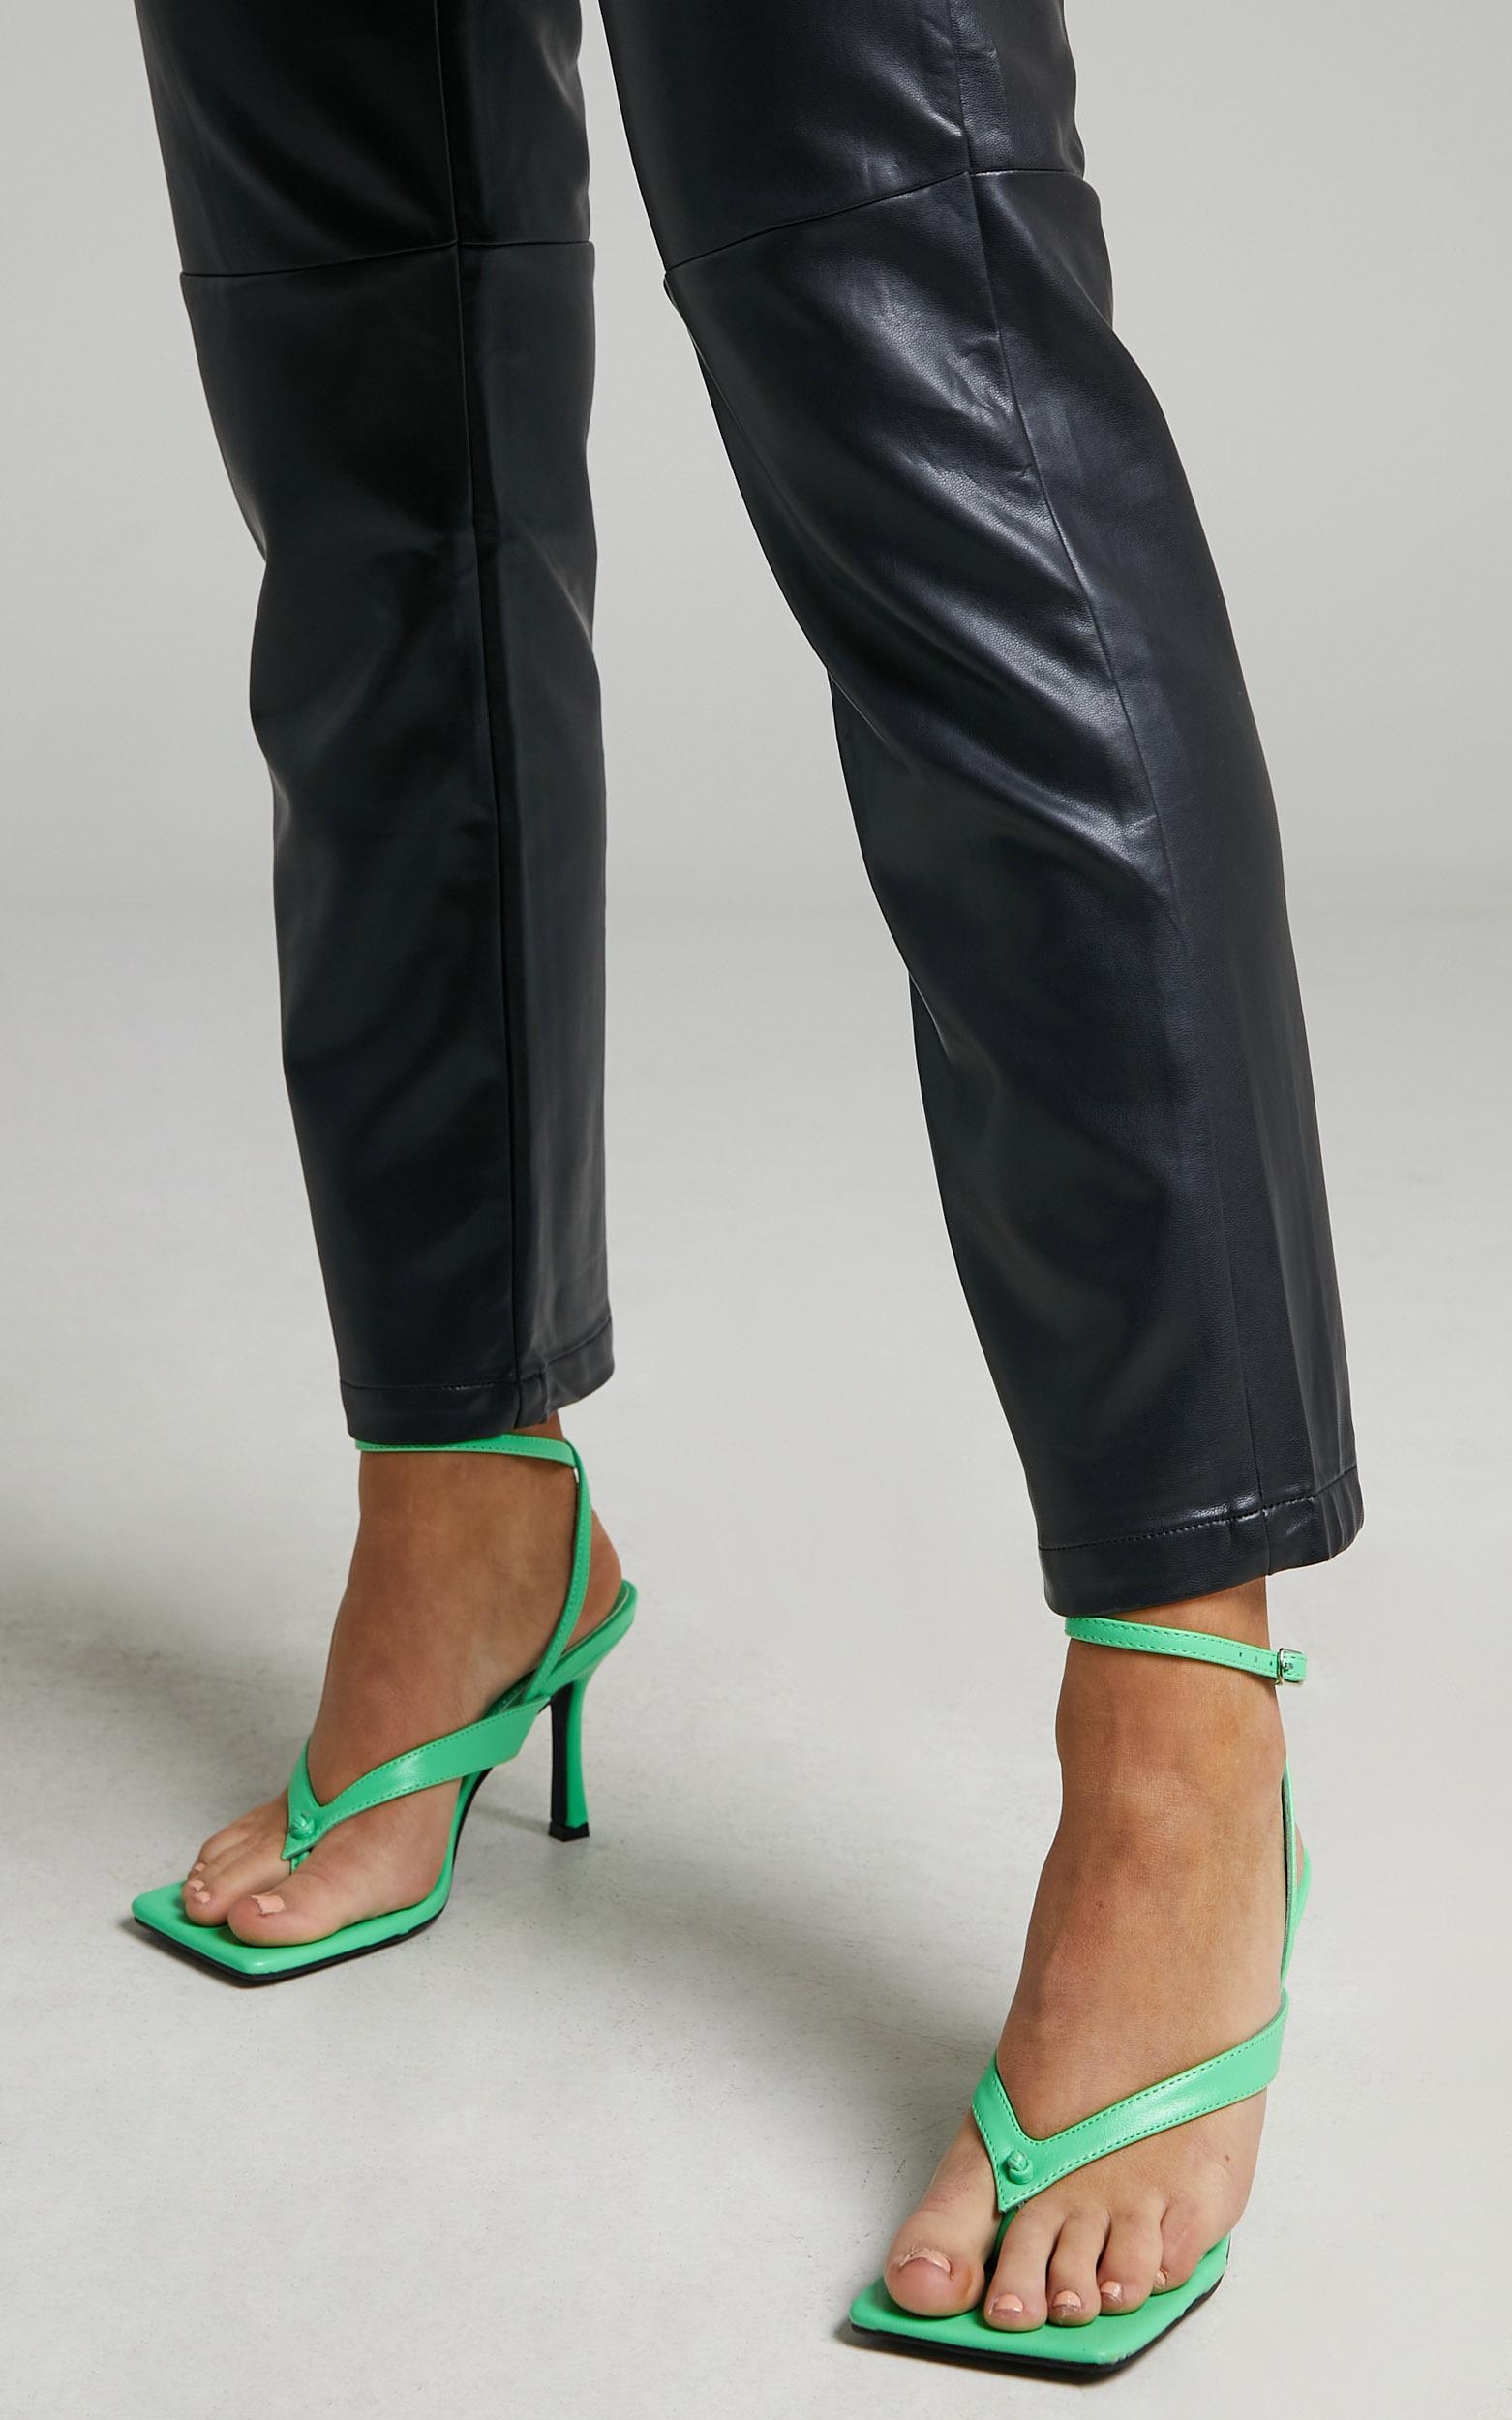 Public Desire - Flamingo Heels in Green PU - 05, GRN1, hi-res image number null